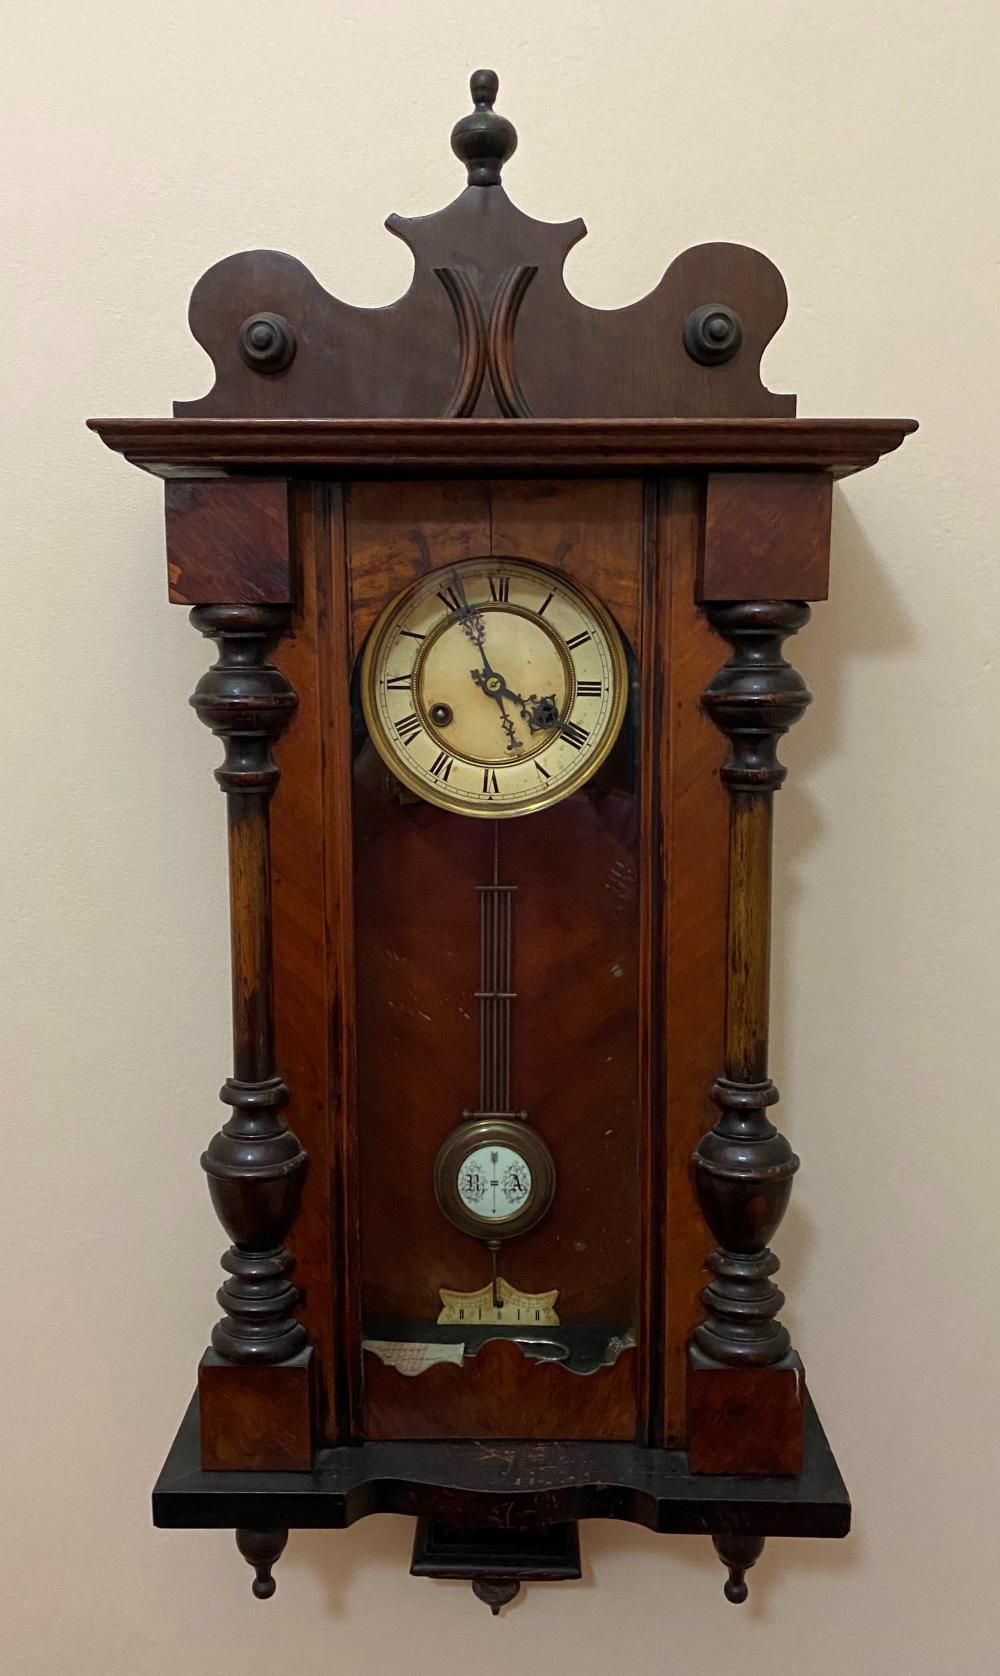 A Timber Framed Wall Clock